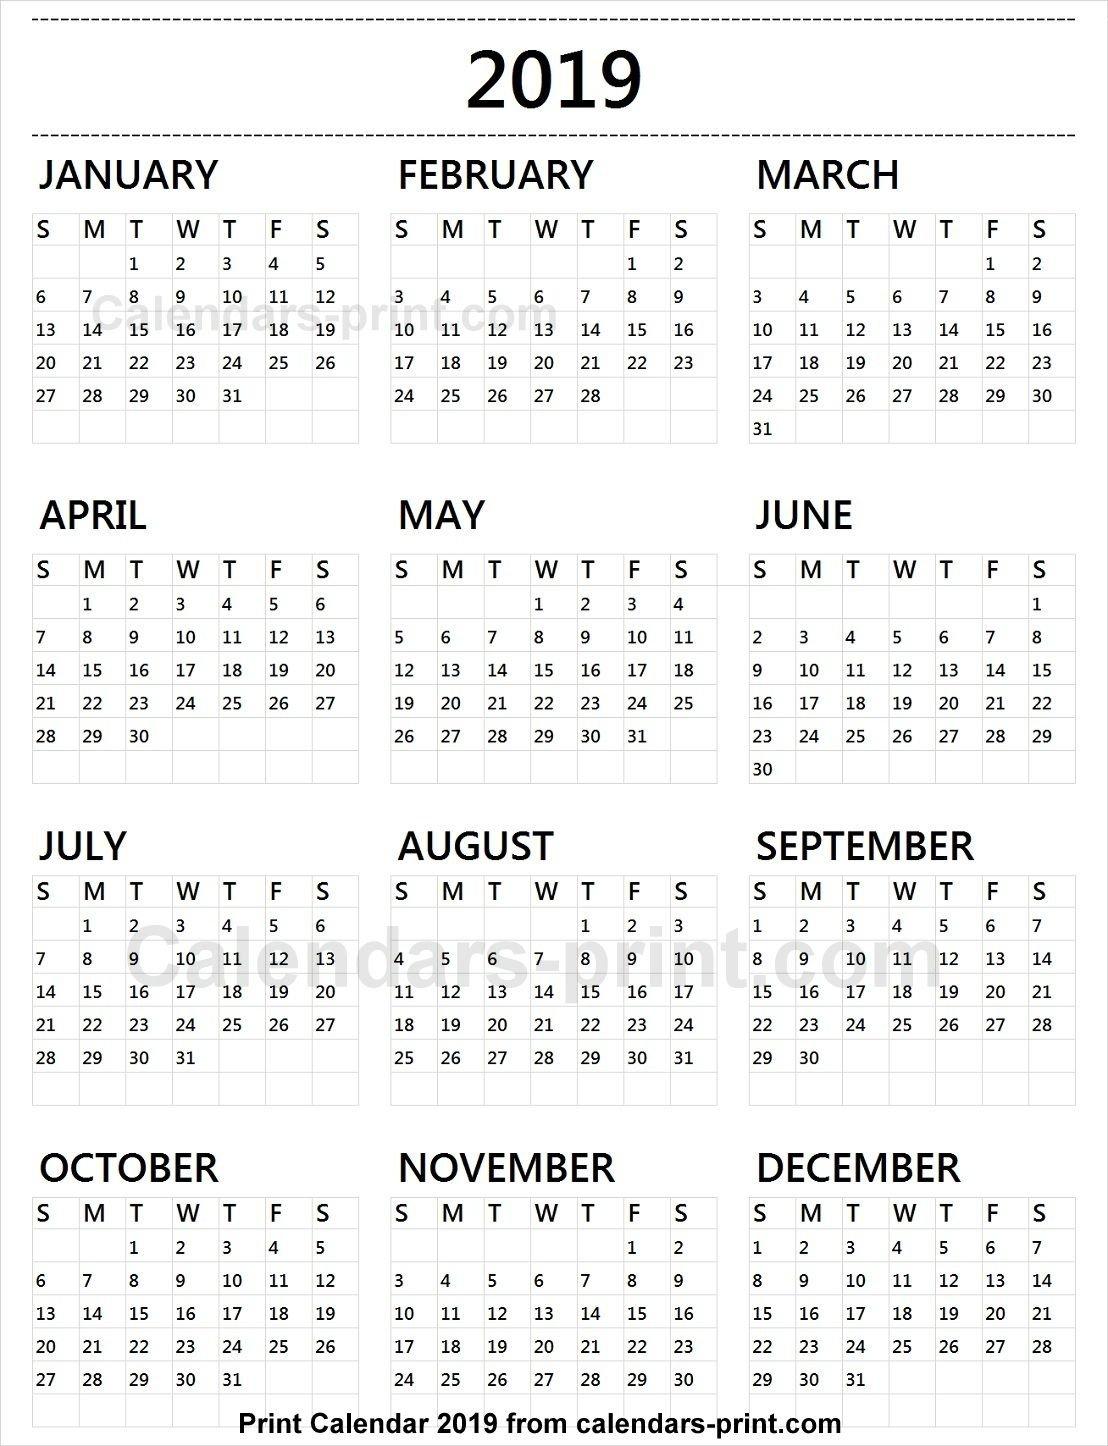 Calendar 2019 Tumblr | 2019 Yearly Calendar In 2019 | Free Calendar Calendar 2019 Free Template